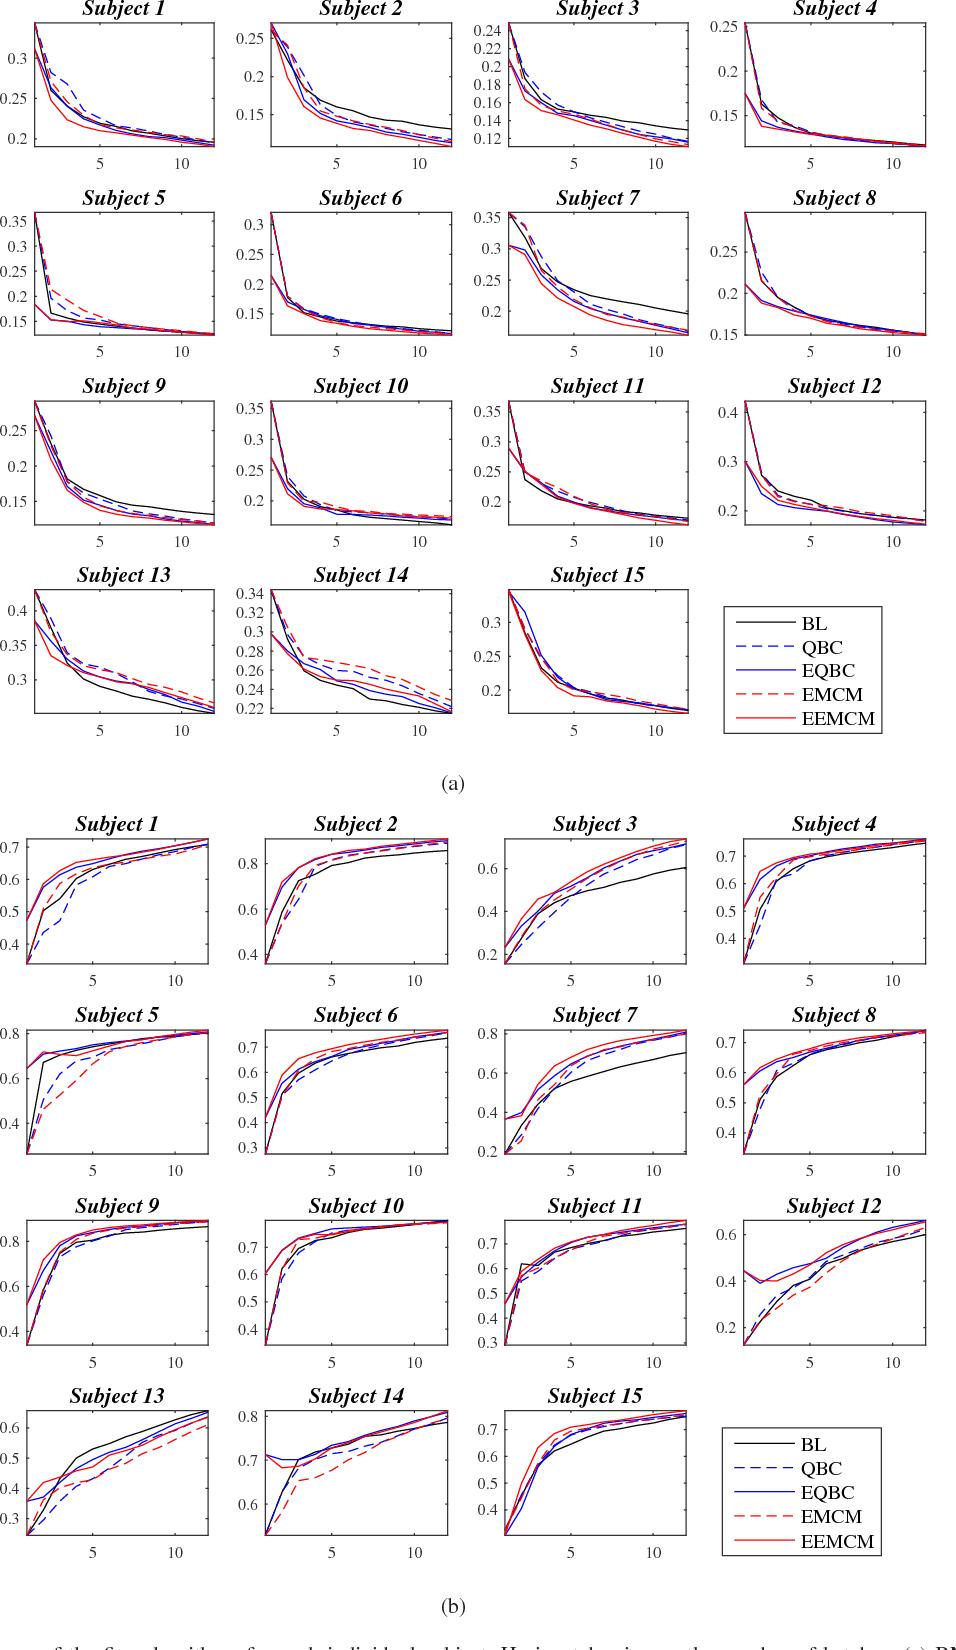 Figure 3 for Offline EEG-Based Driver Drowsiness Estimation Using Enhanced Batch-Mode Active Learning (EBMAL) for Regression